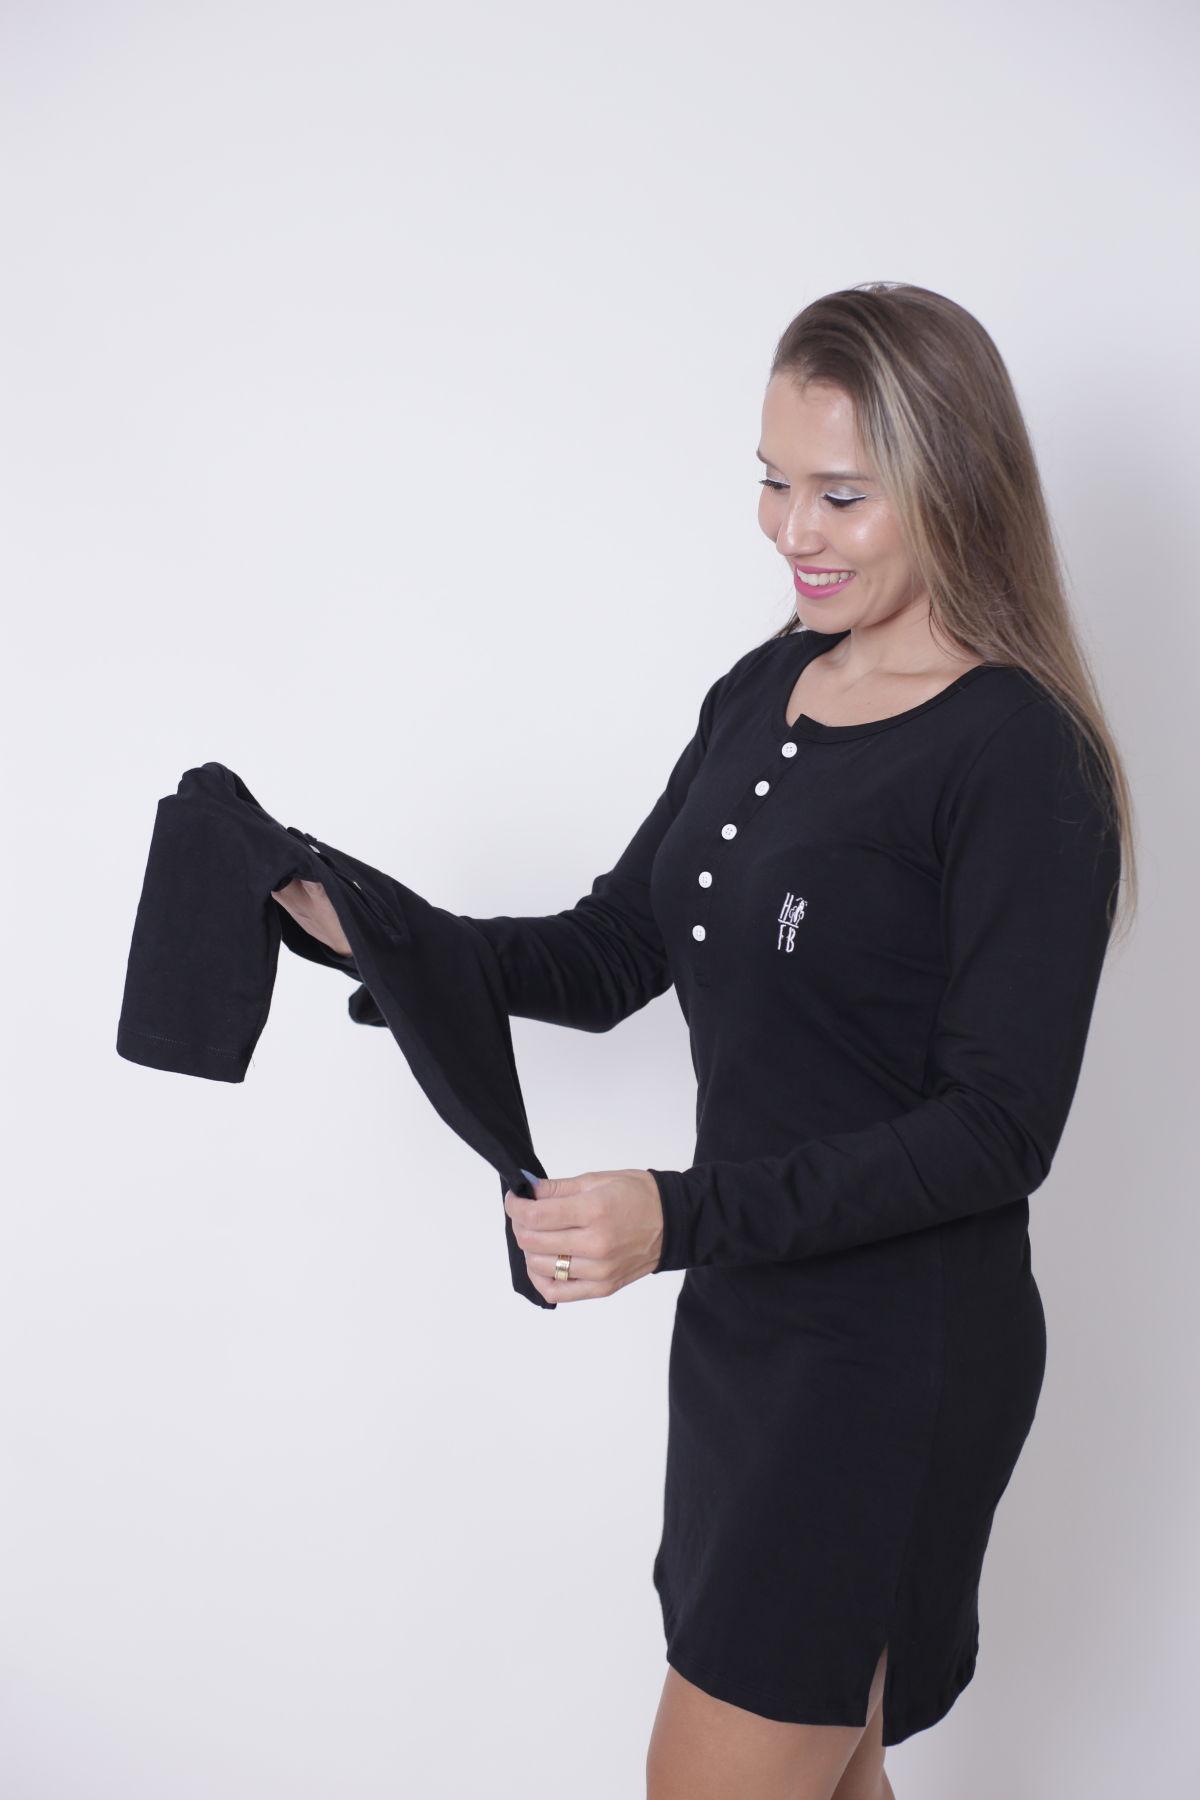 MÃE E FILHO > Kit Vestido + Body Infantil Unissex - Henley - Preto Manga Longa [Coleção Tal Mãe Tal Filho]  - Heitor Fashion Brazil